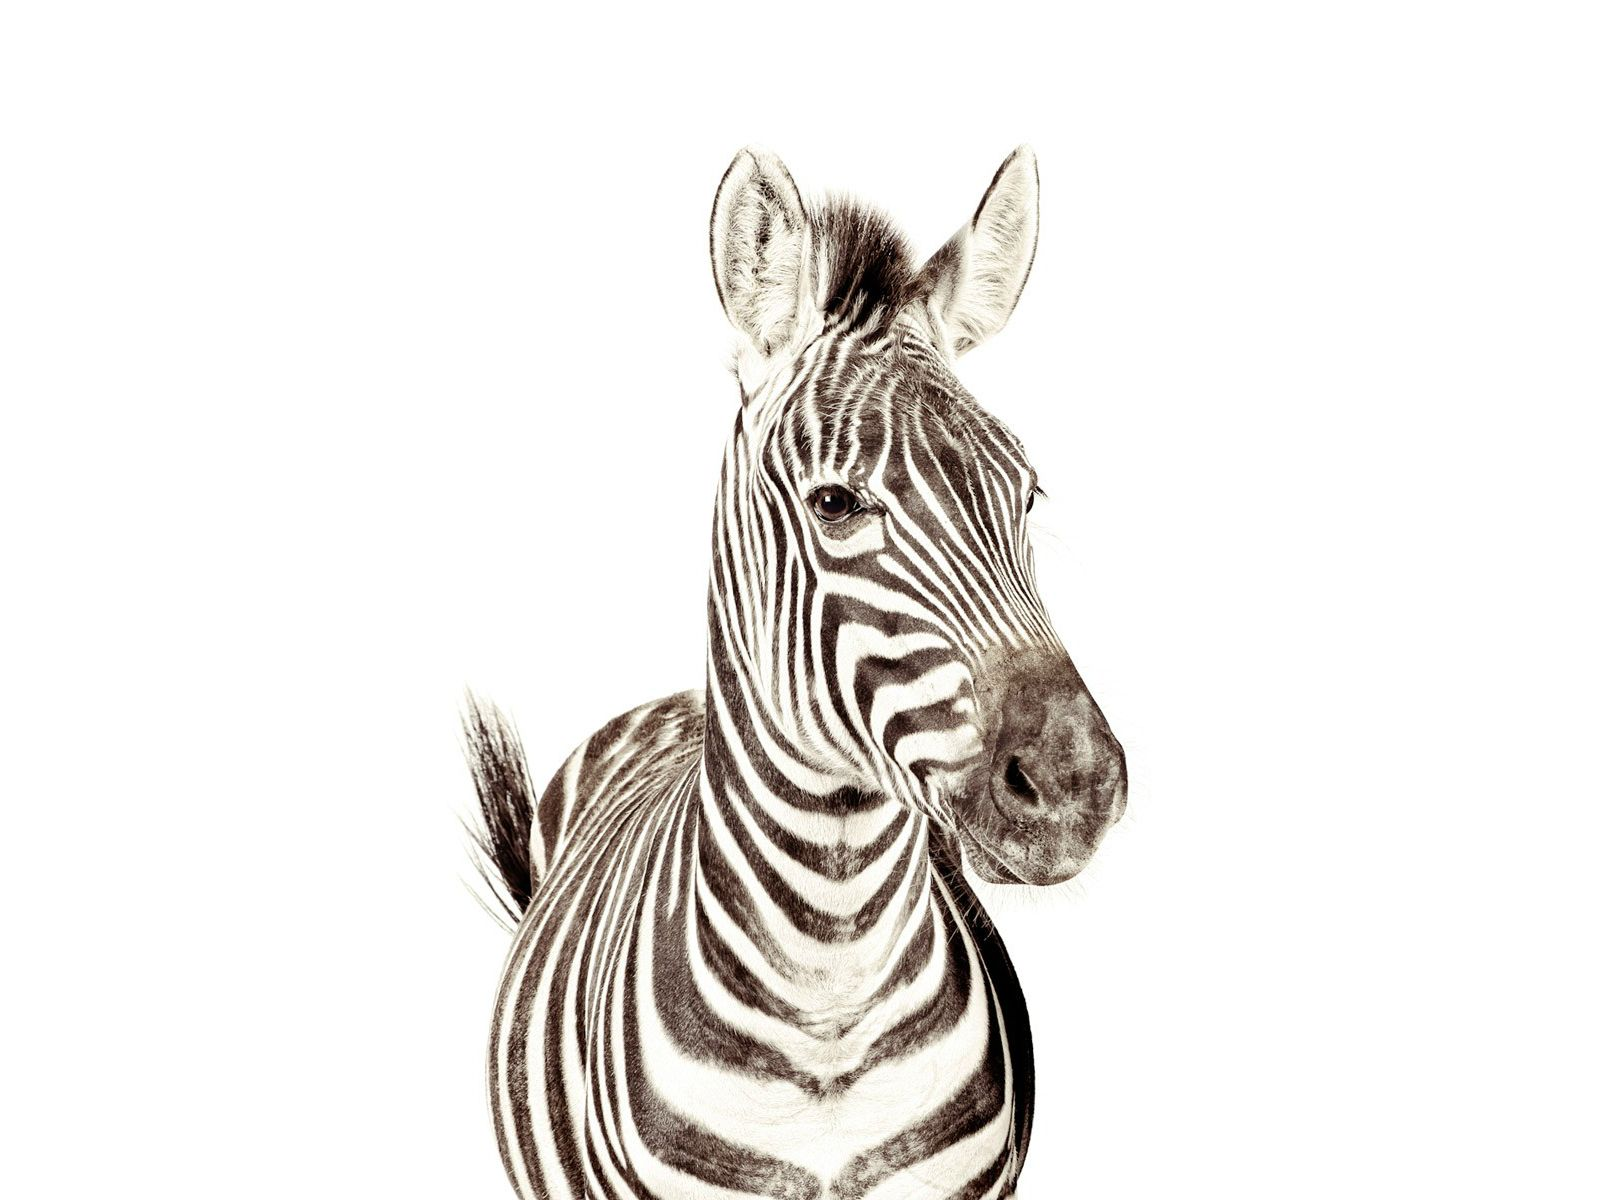 Behang Kinderkamer Zebra : Magneet behang dierenprint zebra groovy magnets 1 kinderkamers